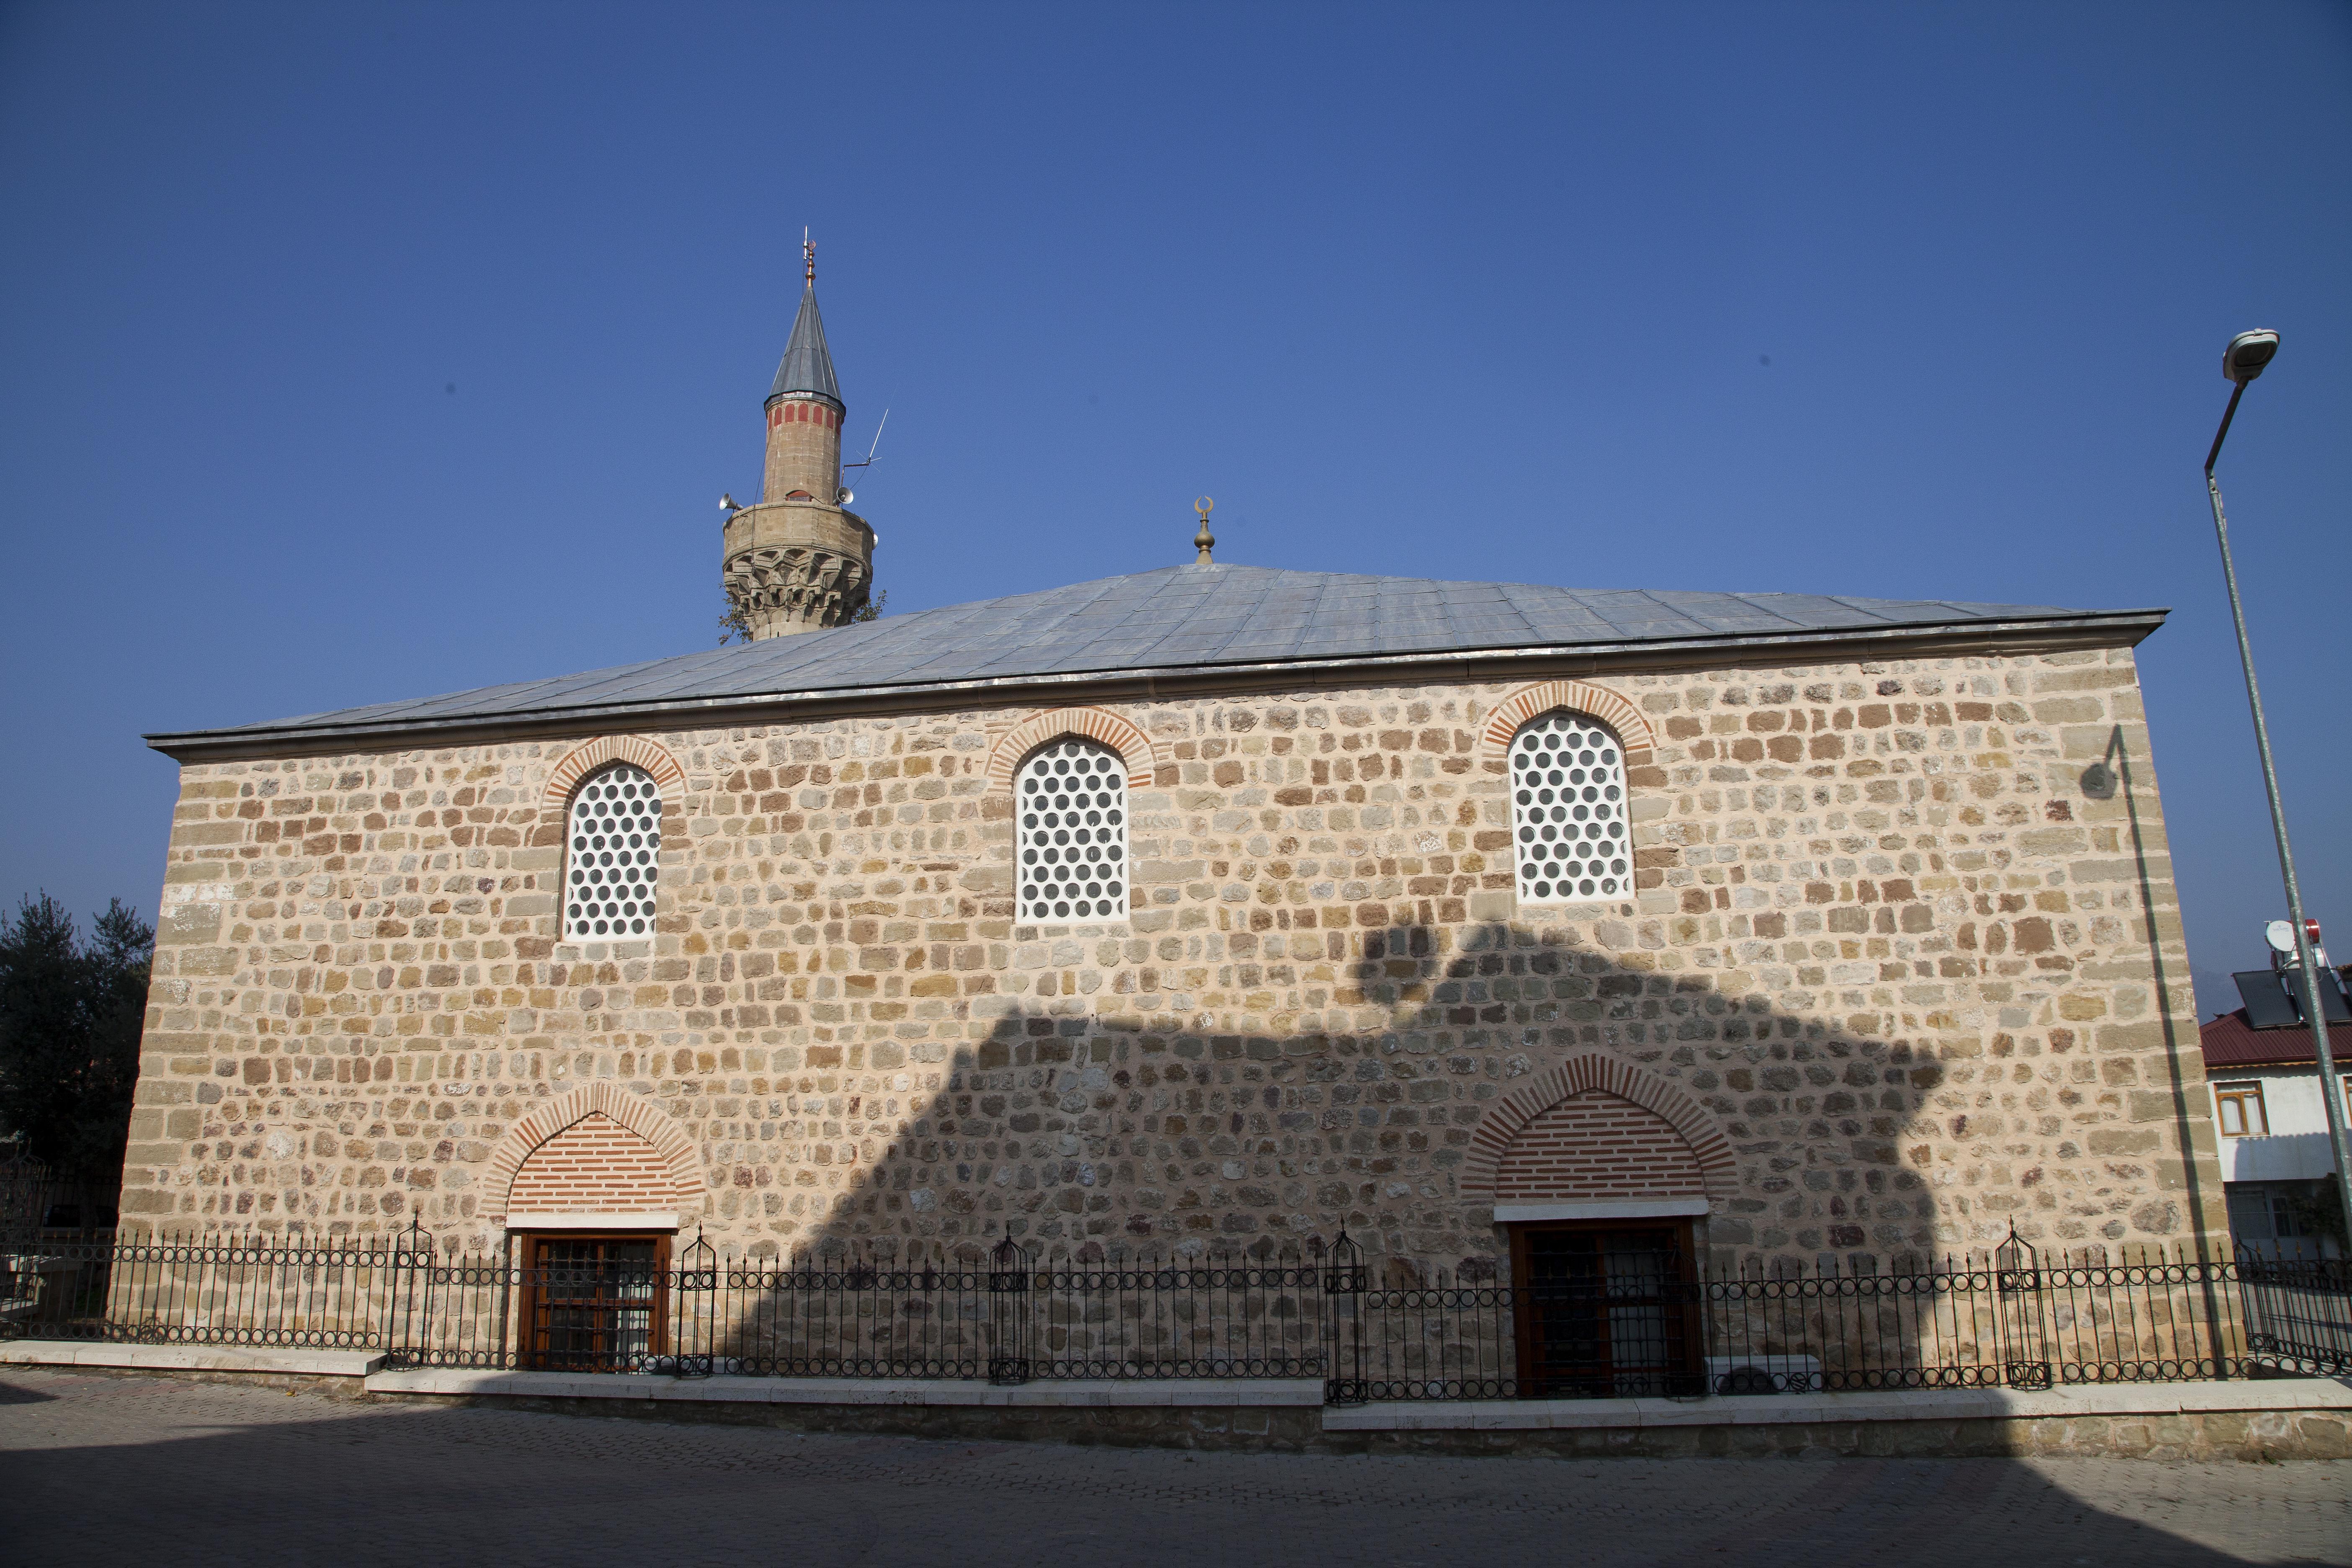 Fotoğraf 19. Rüstem Paşa Camii pencere düzeni.